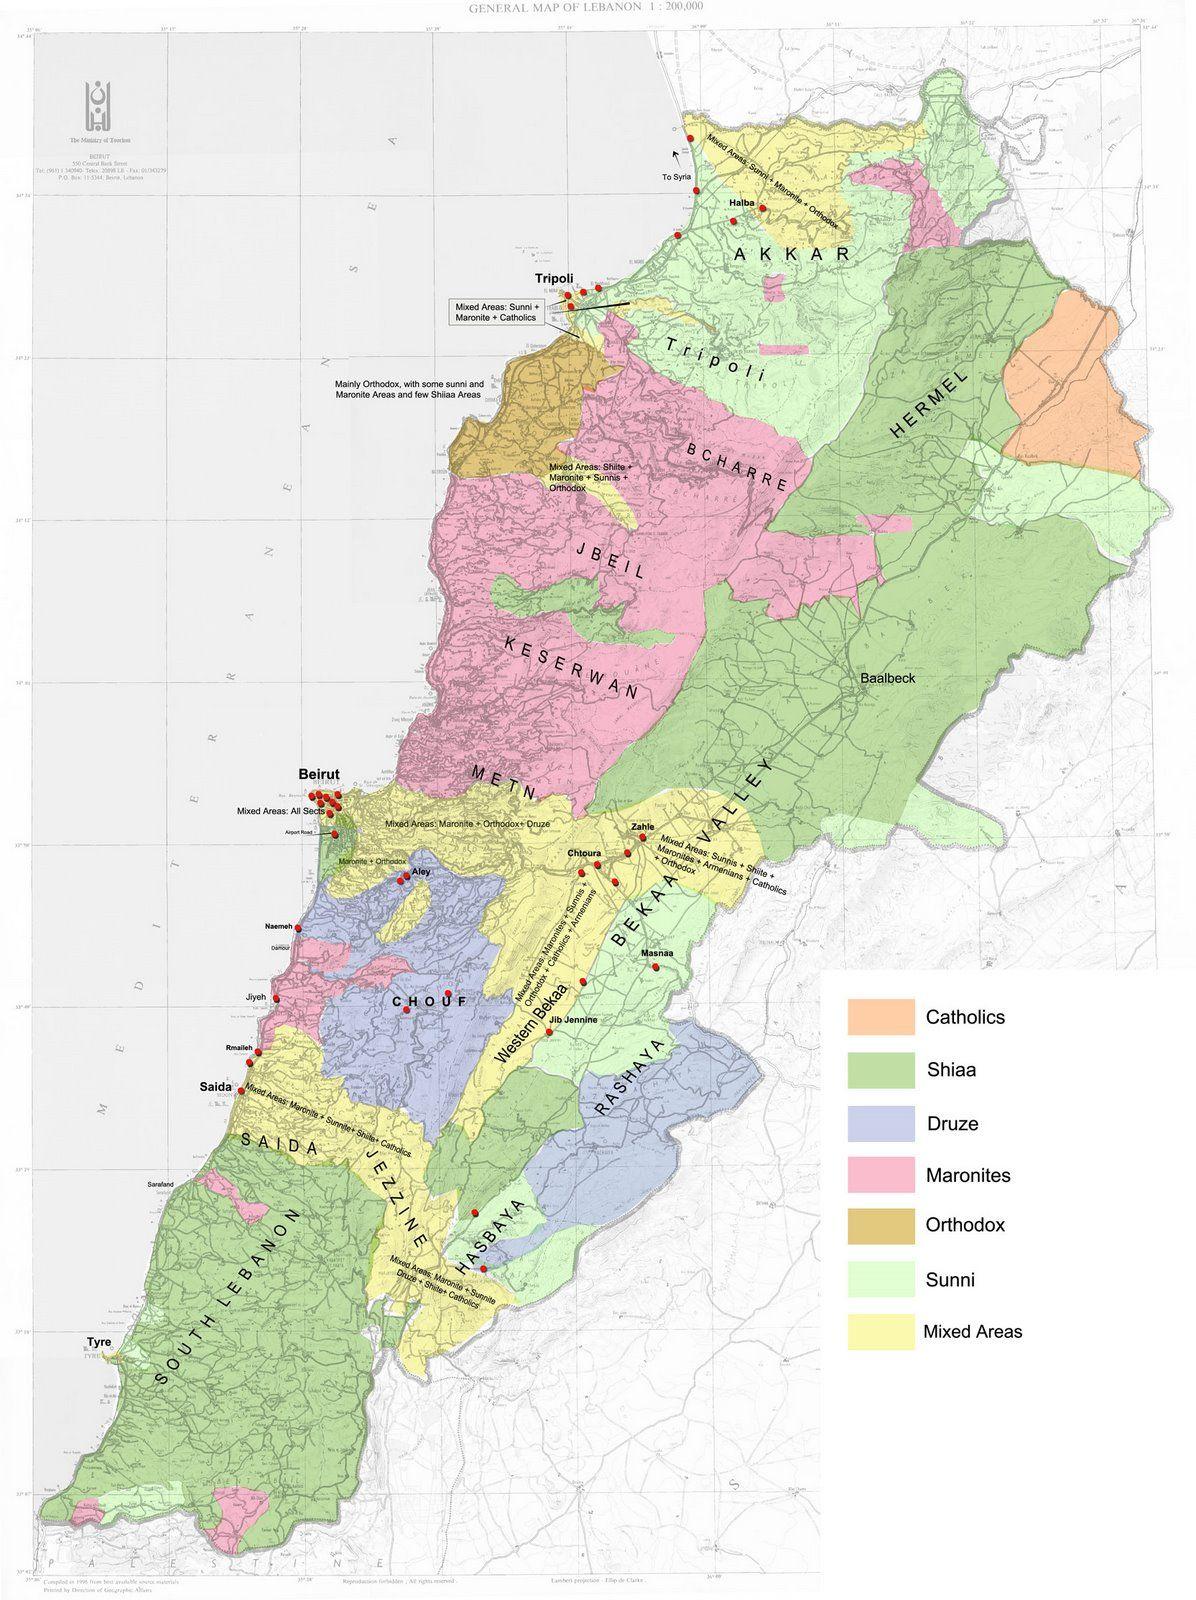 Libanon Geografiske Kort Over Libanon Dansk Encyklopaedi Libanon Wissen Wissenswertes